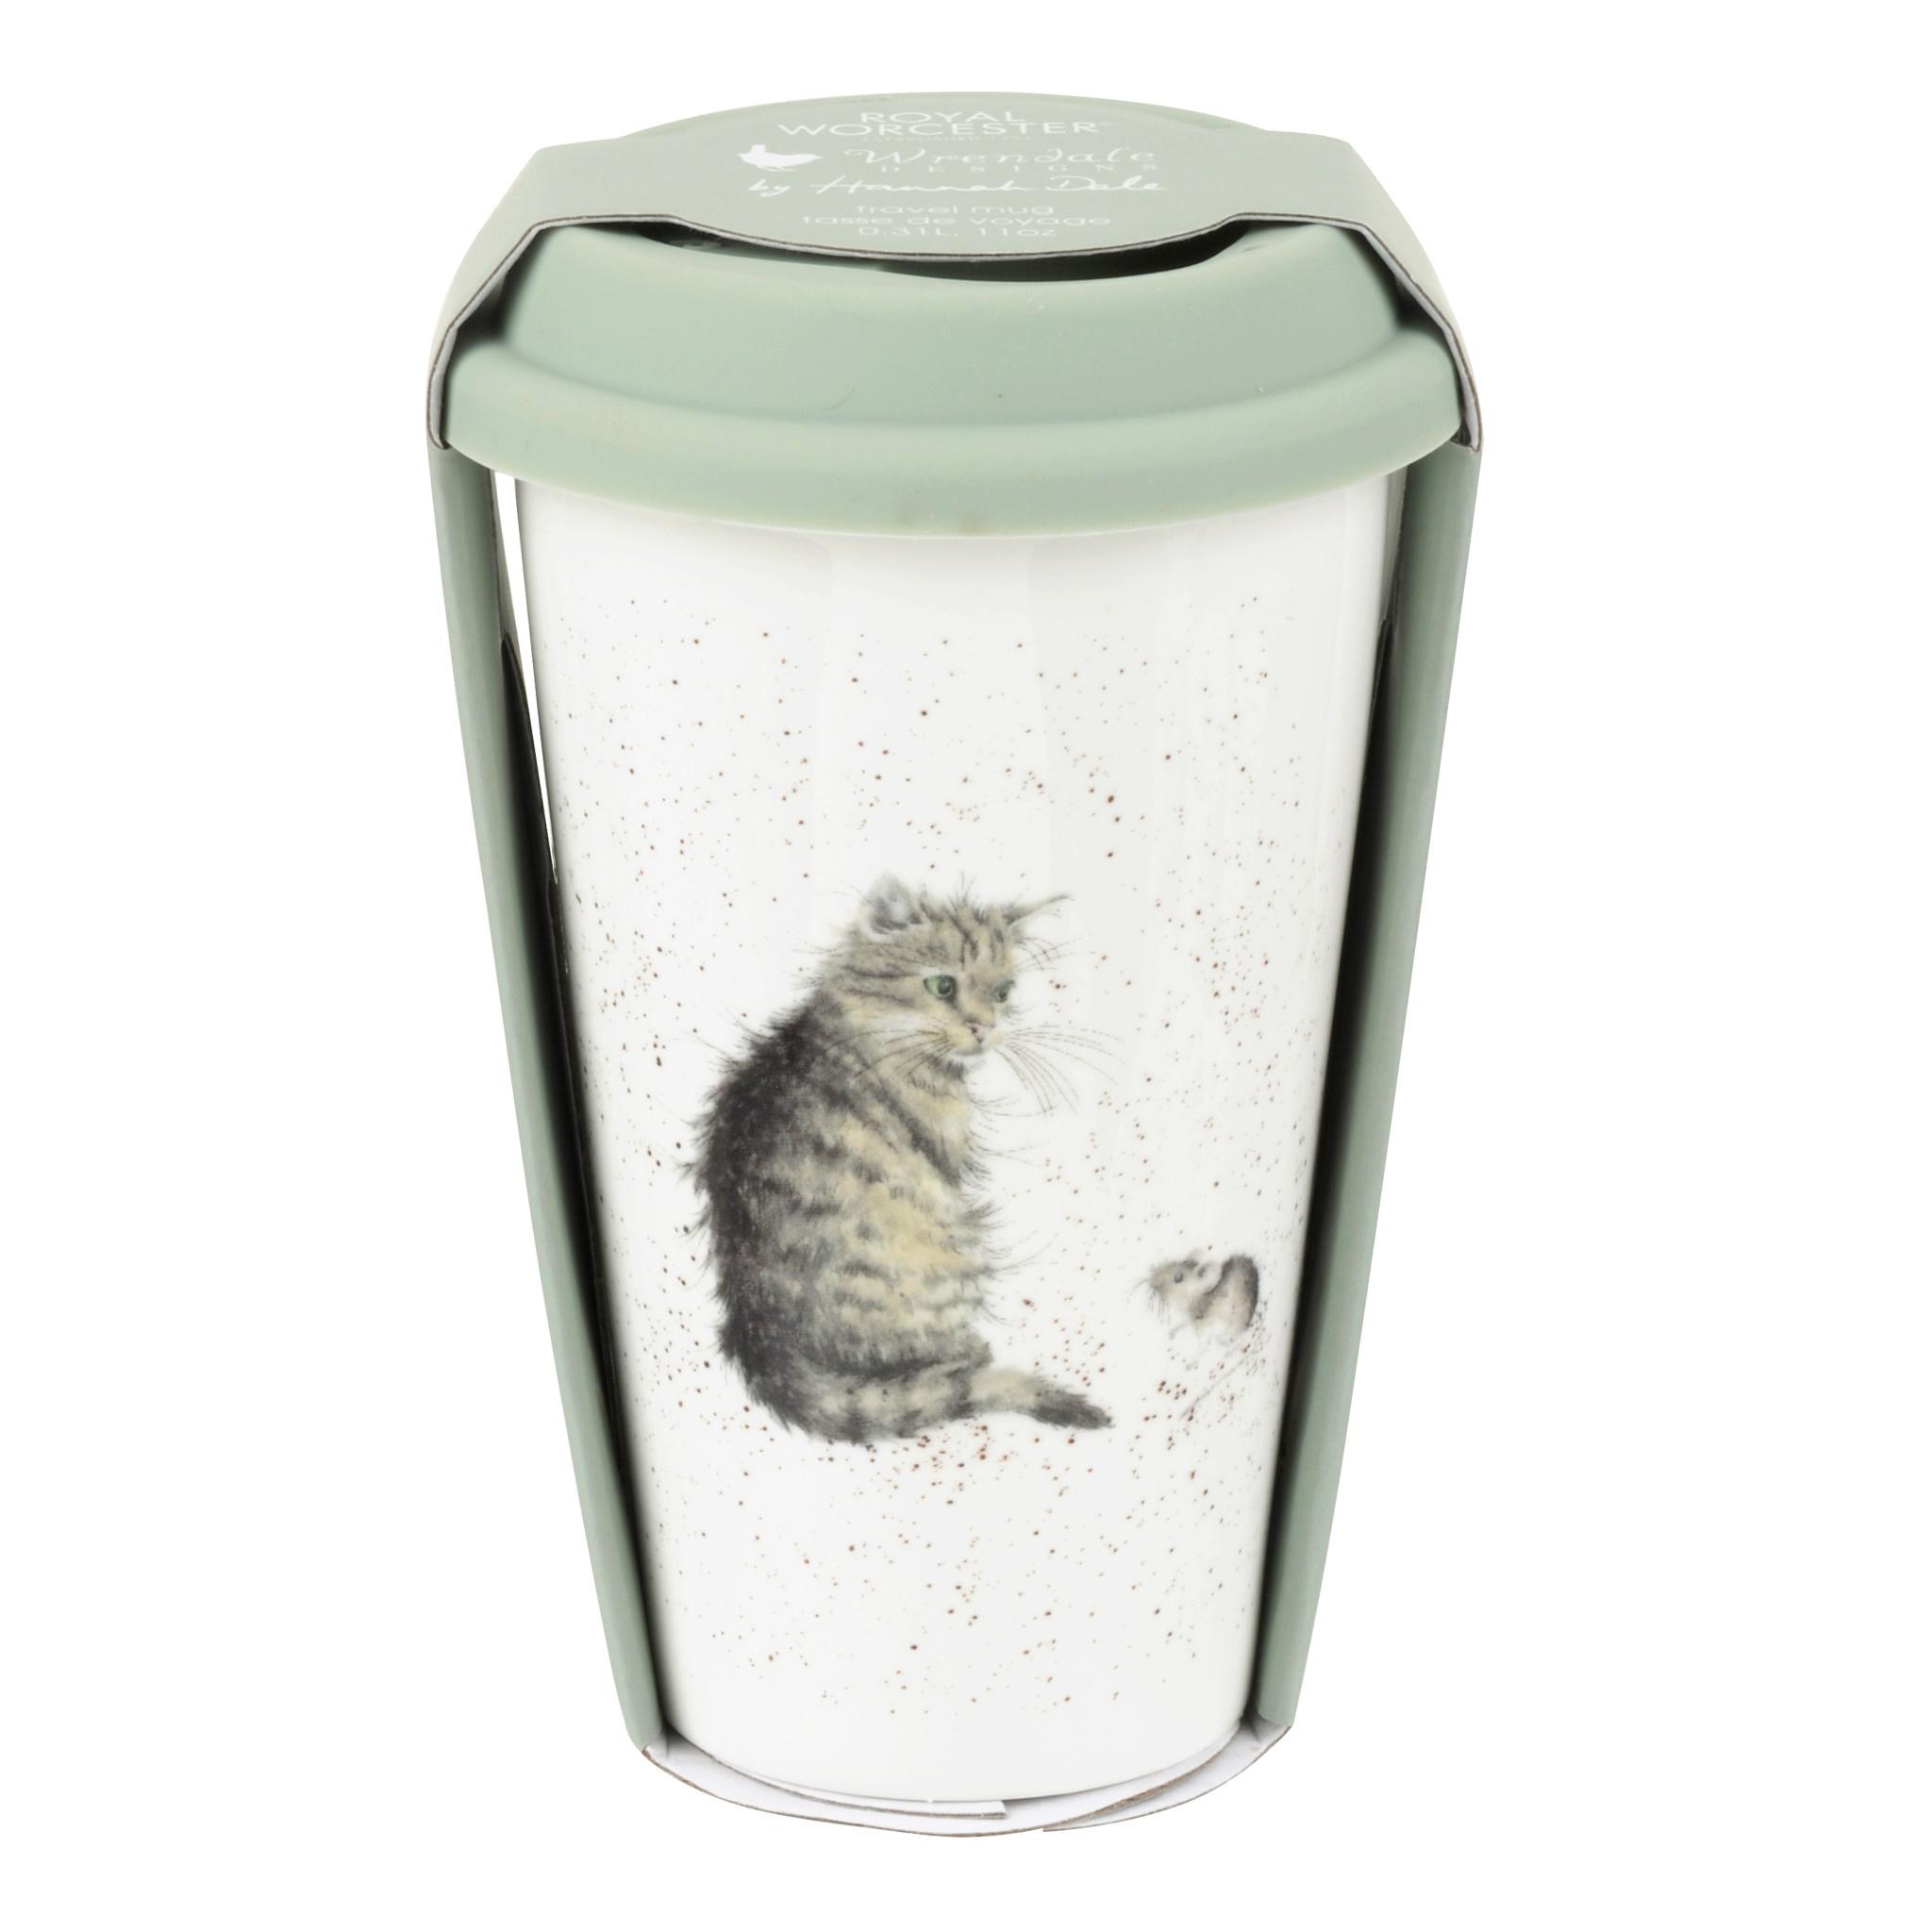 Wrendale Designs 'Cat & Mouse' Travel Mug